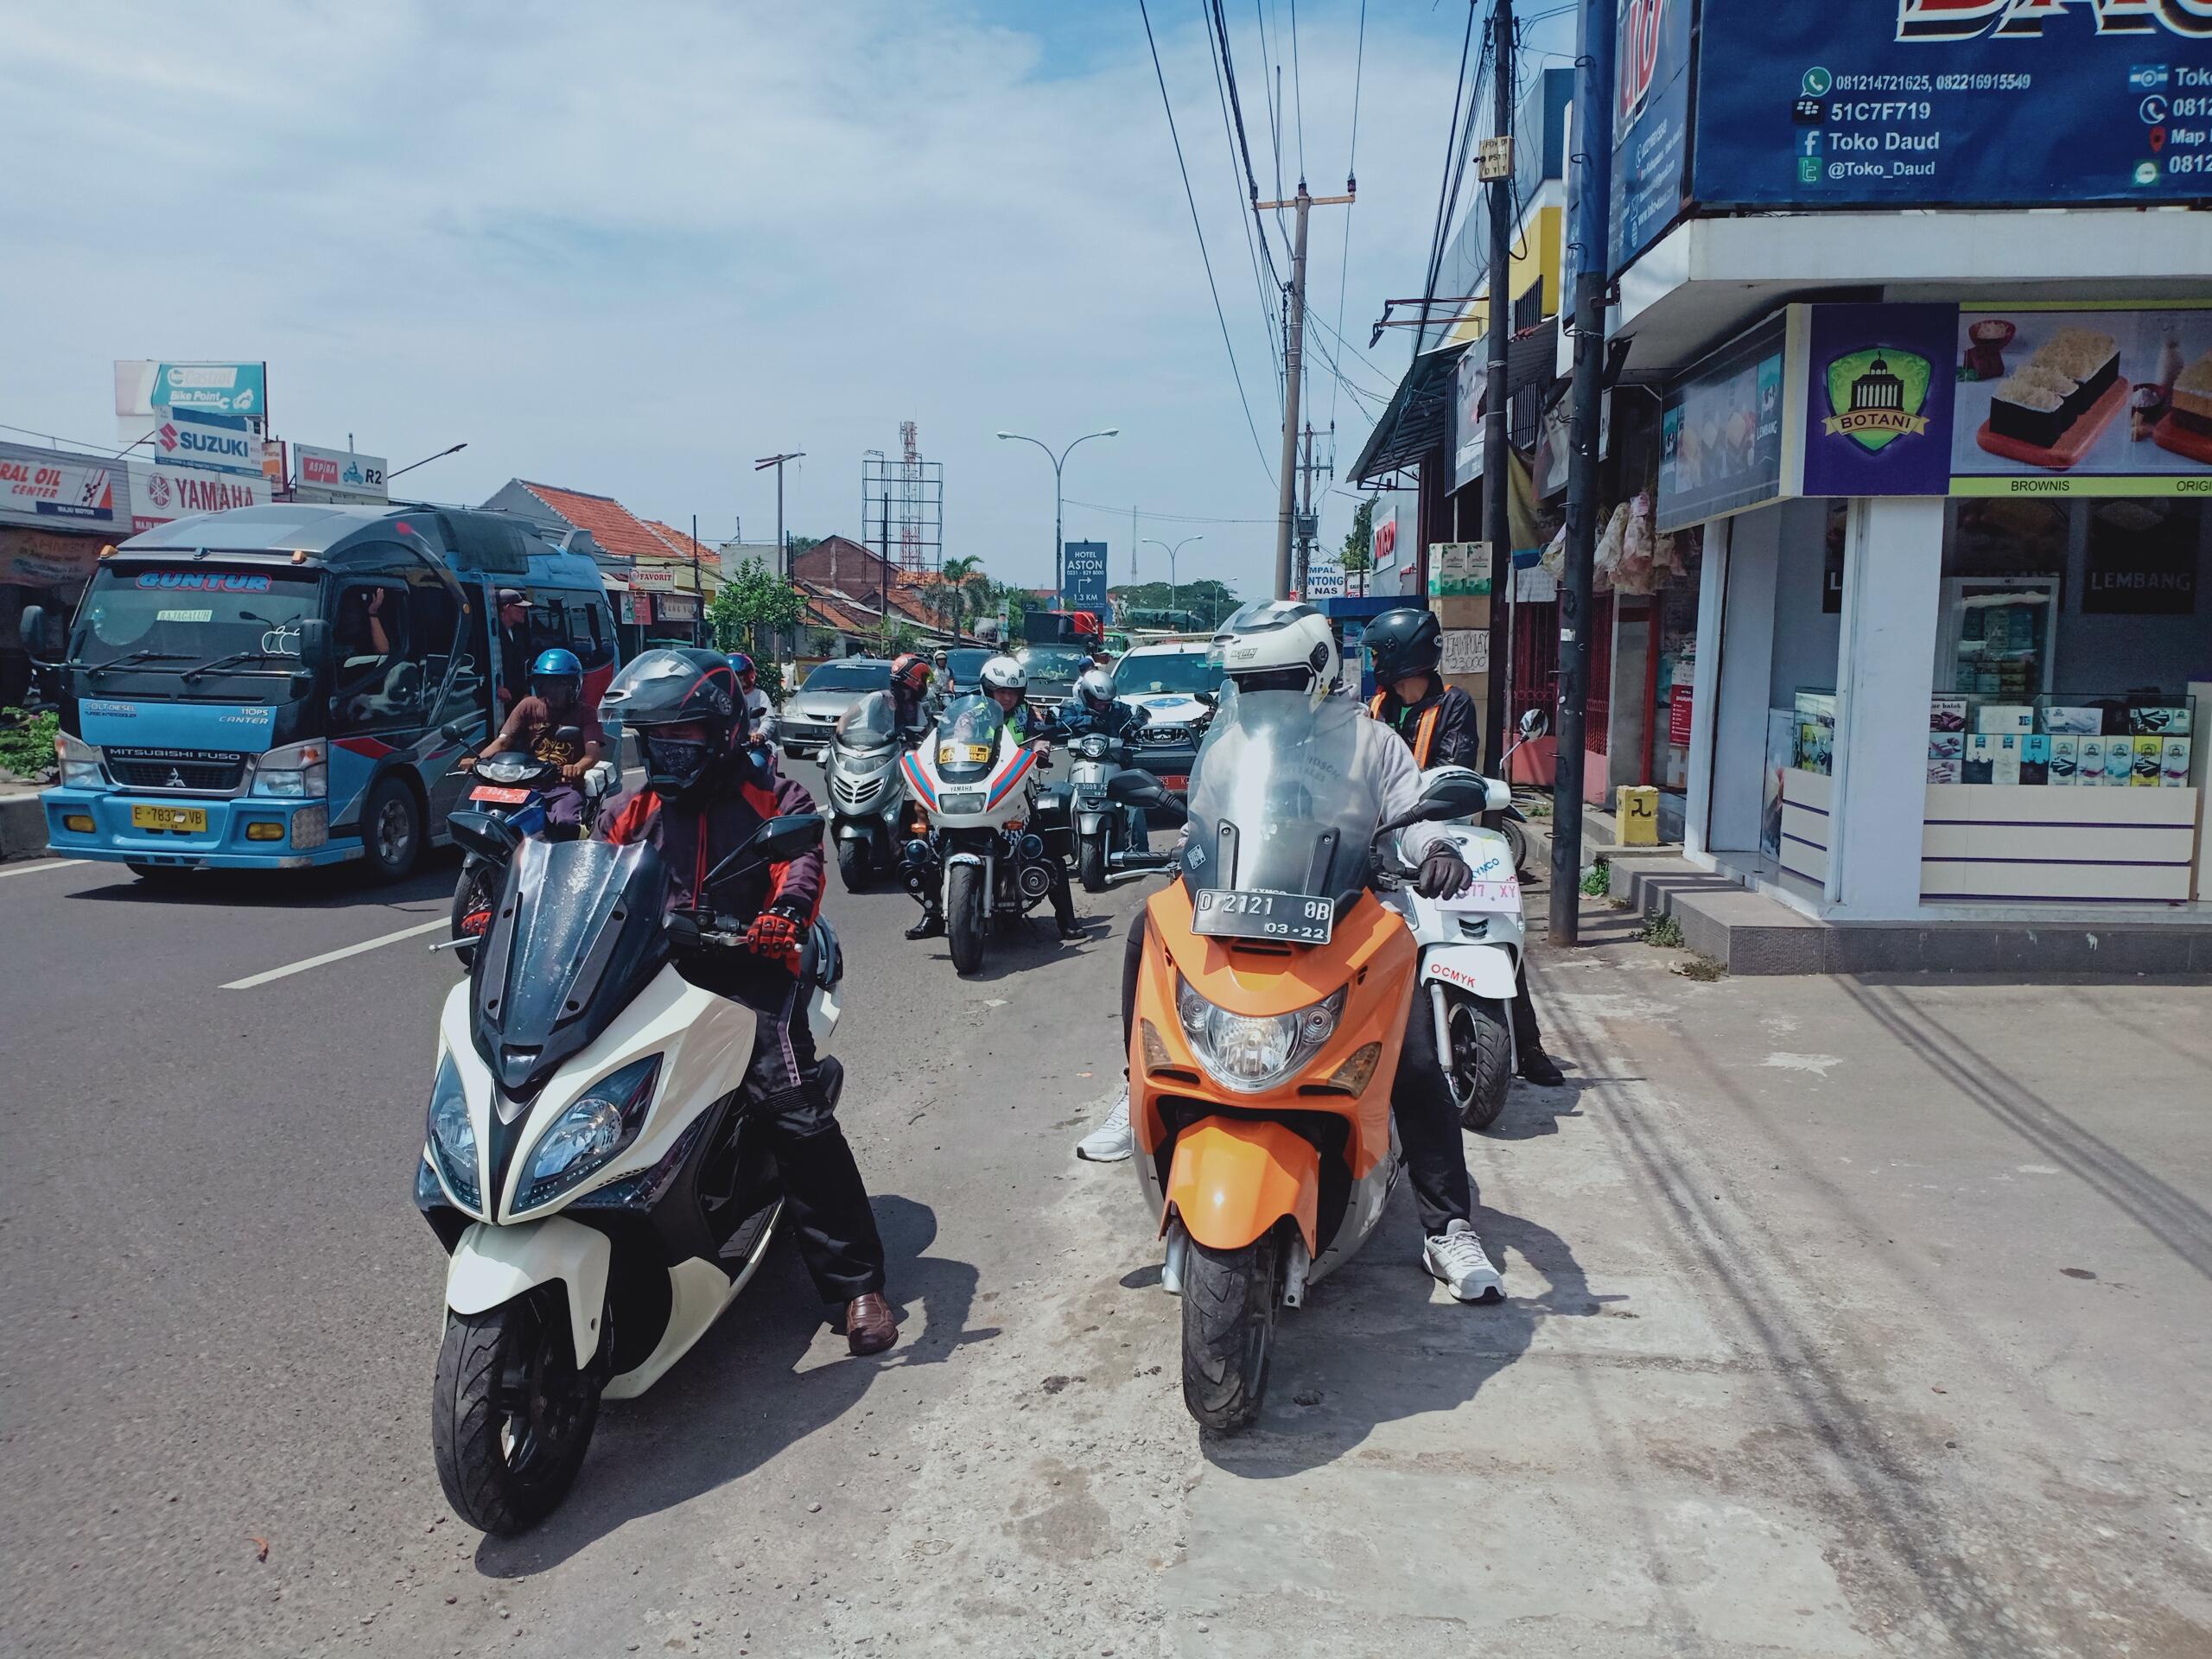 rolling-thunder-kymco-indonesia-community-cirebon-2019